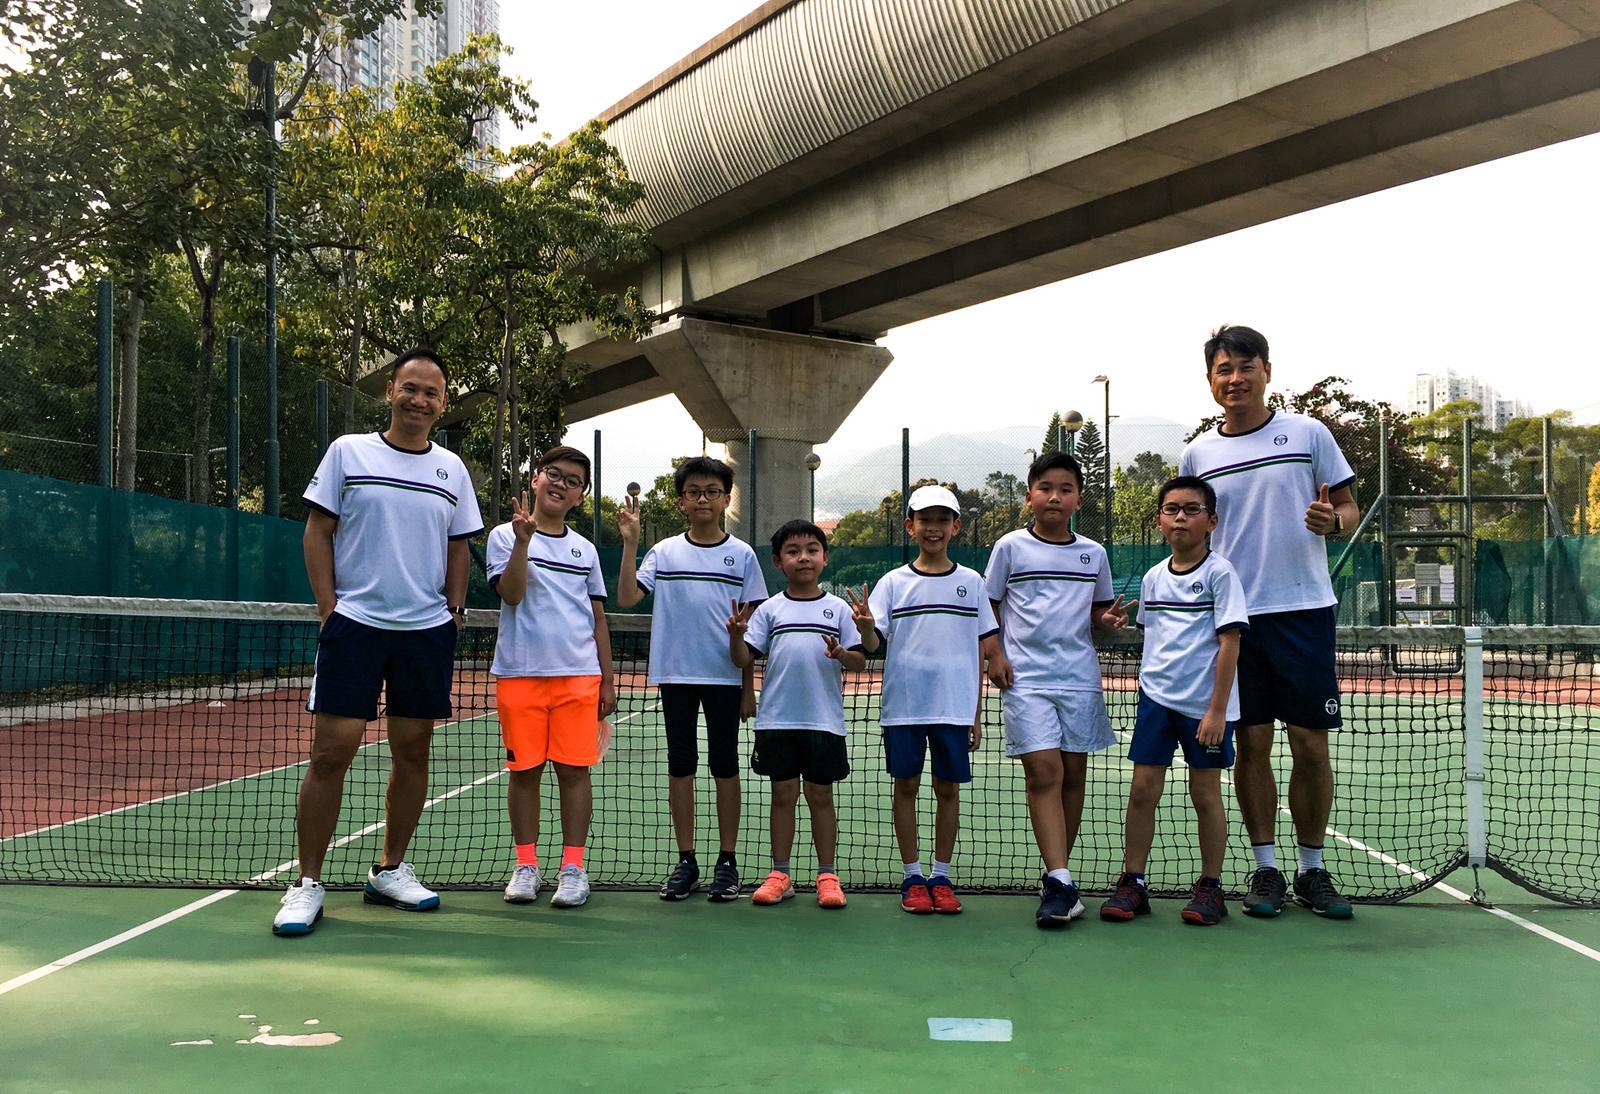 { en: 'HomeSporter Tennis Lessons Hong Kong', cn: '運動世家網球學院' } 1